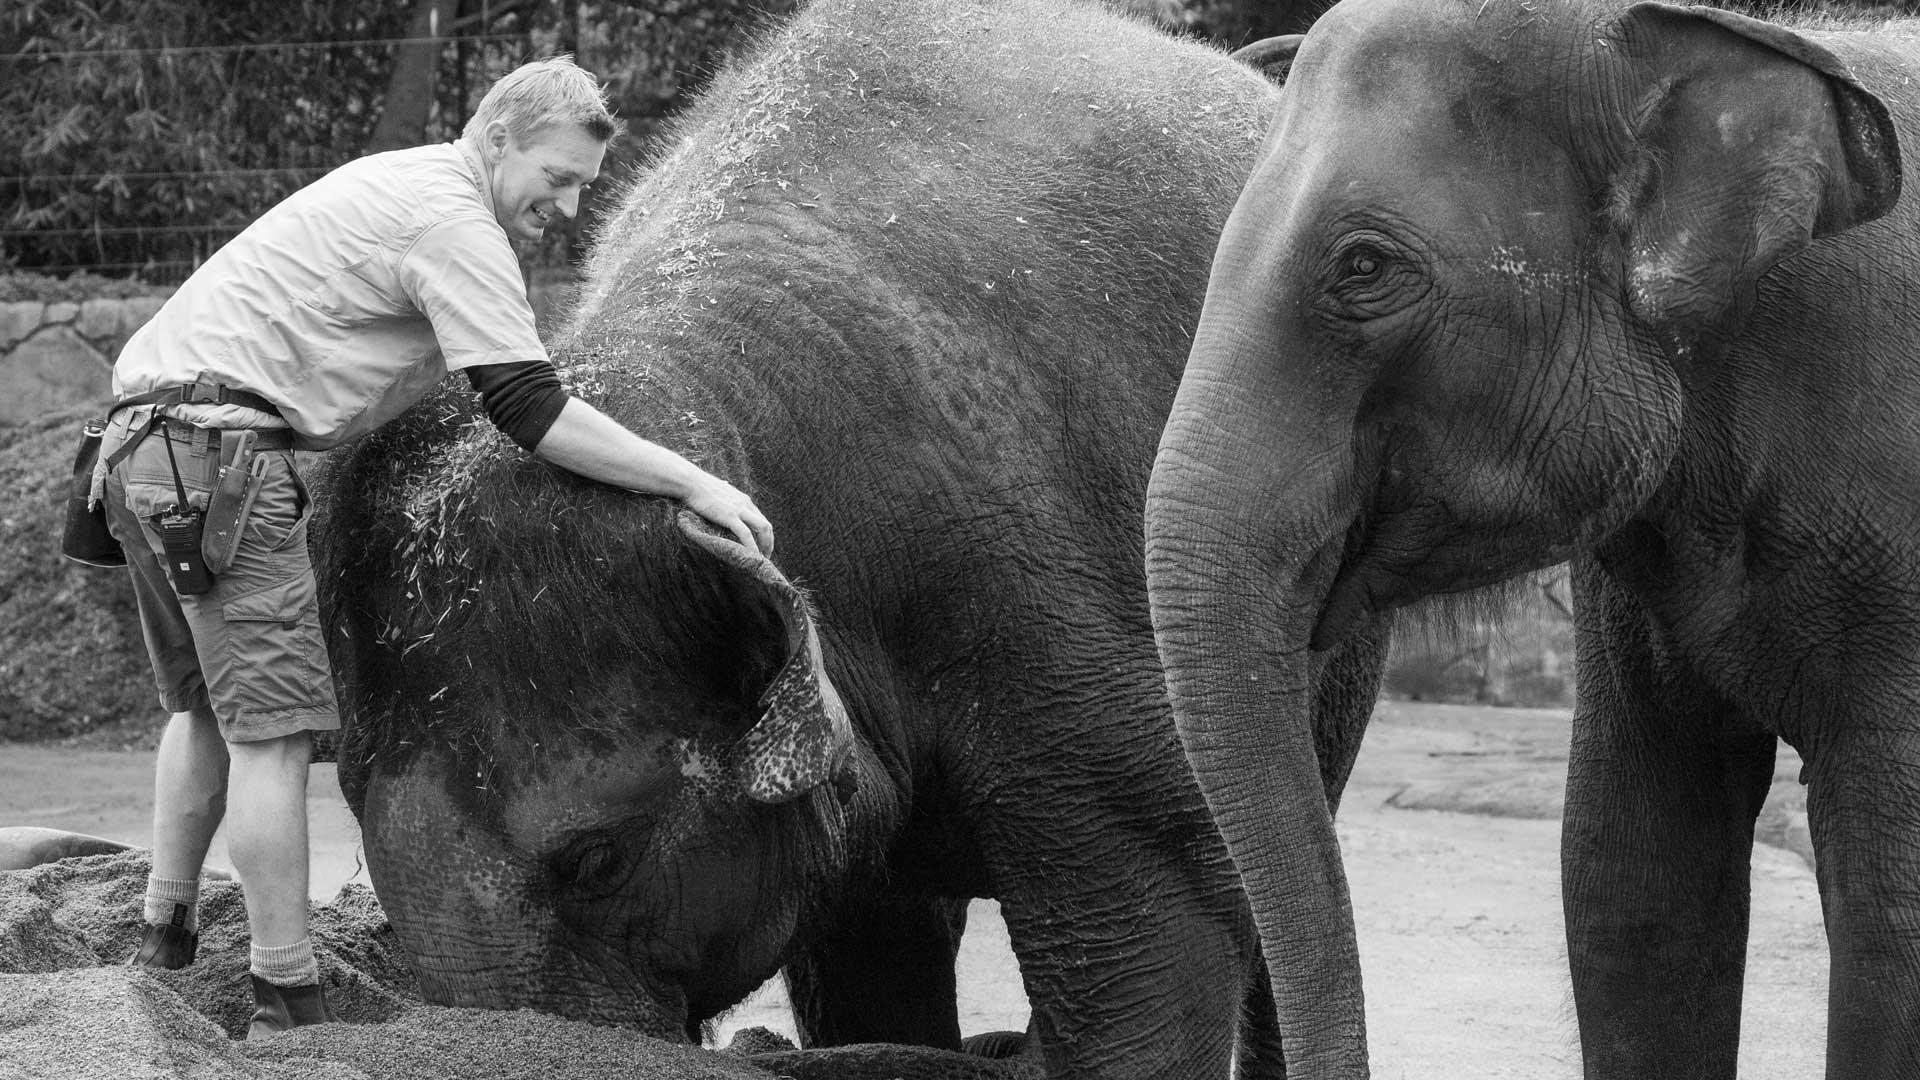 https://rfacdn.nz/zoo/assets/media/world-elephant-day-gallery-8.jpg